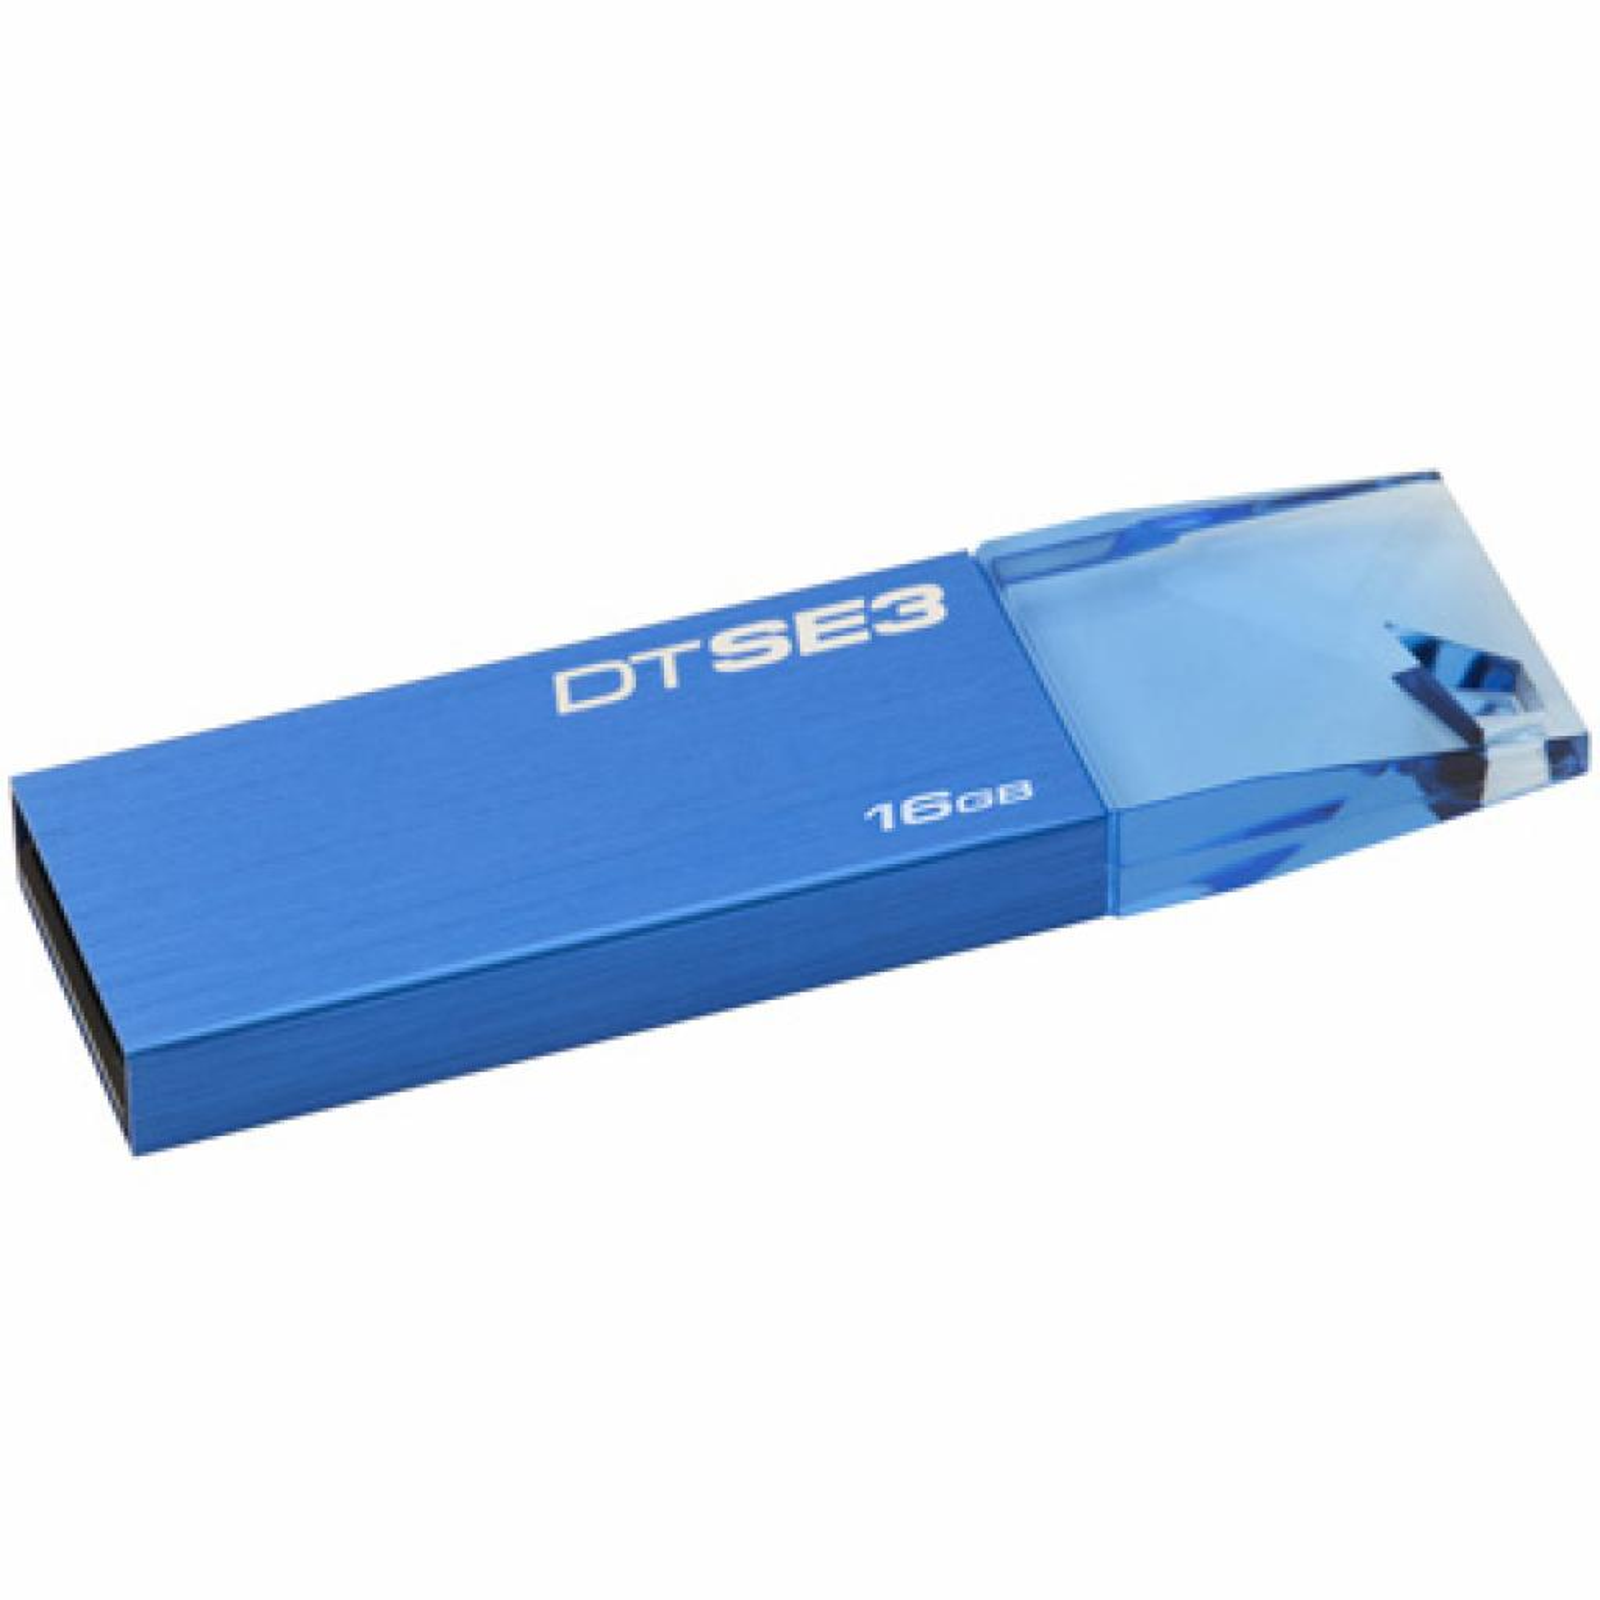 USB флеш накопитель Kingston 32Gb DataTraveler SE3 blue (KC-U6832-3YB)